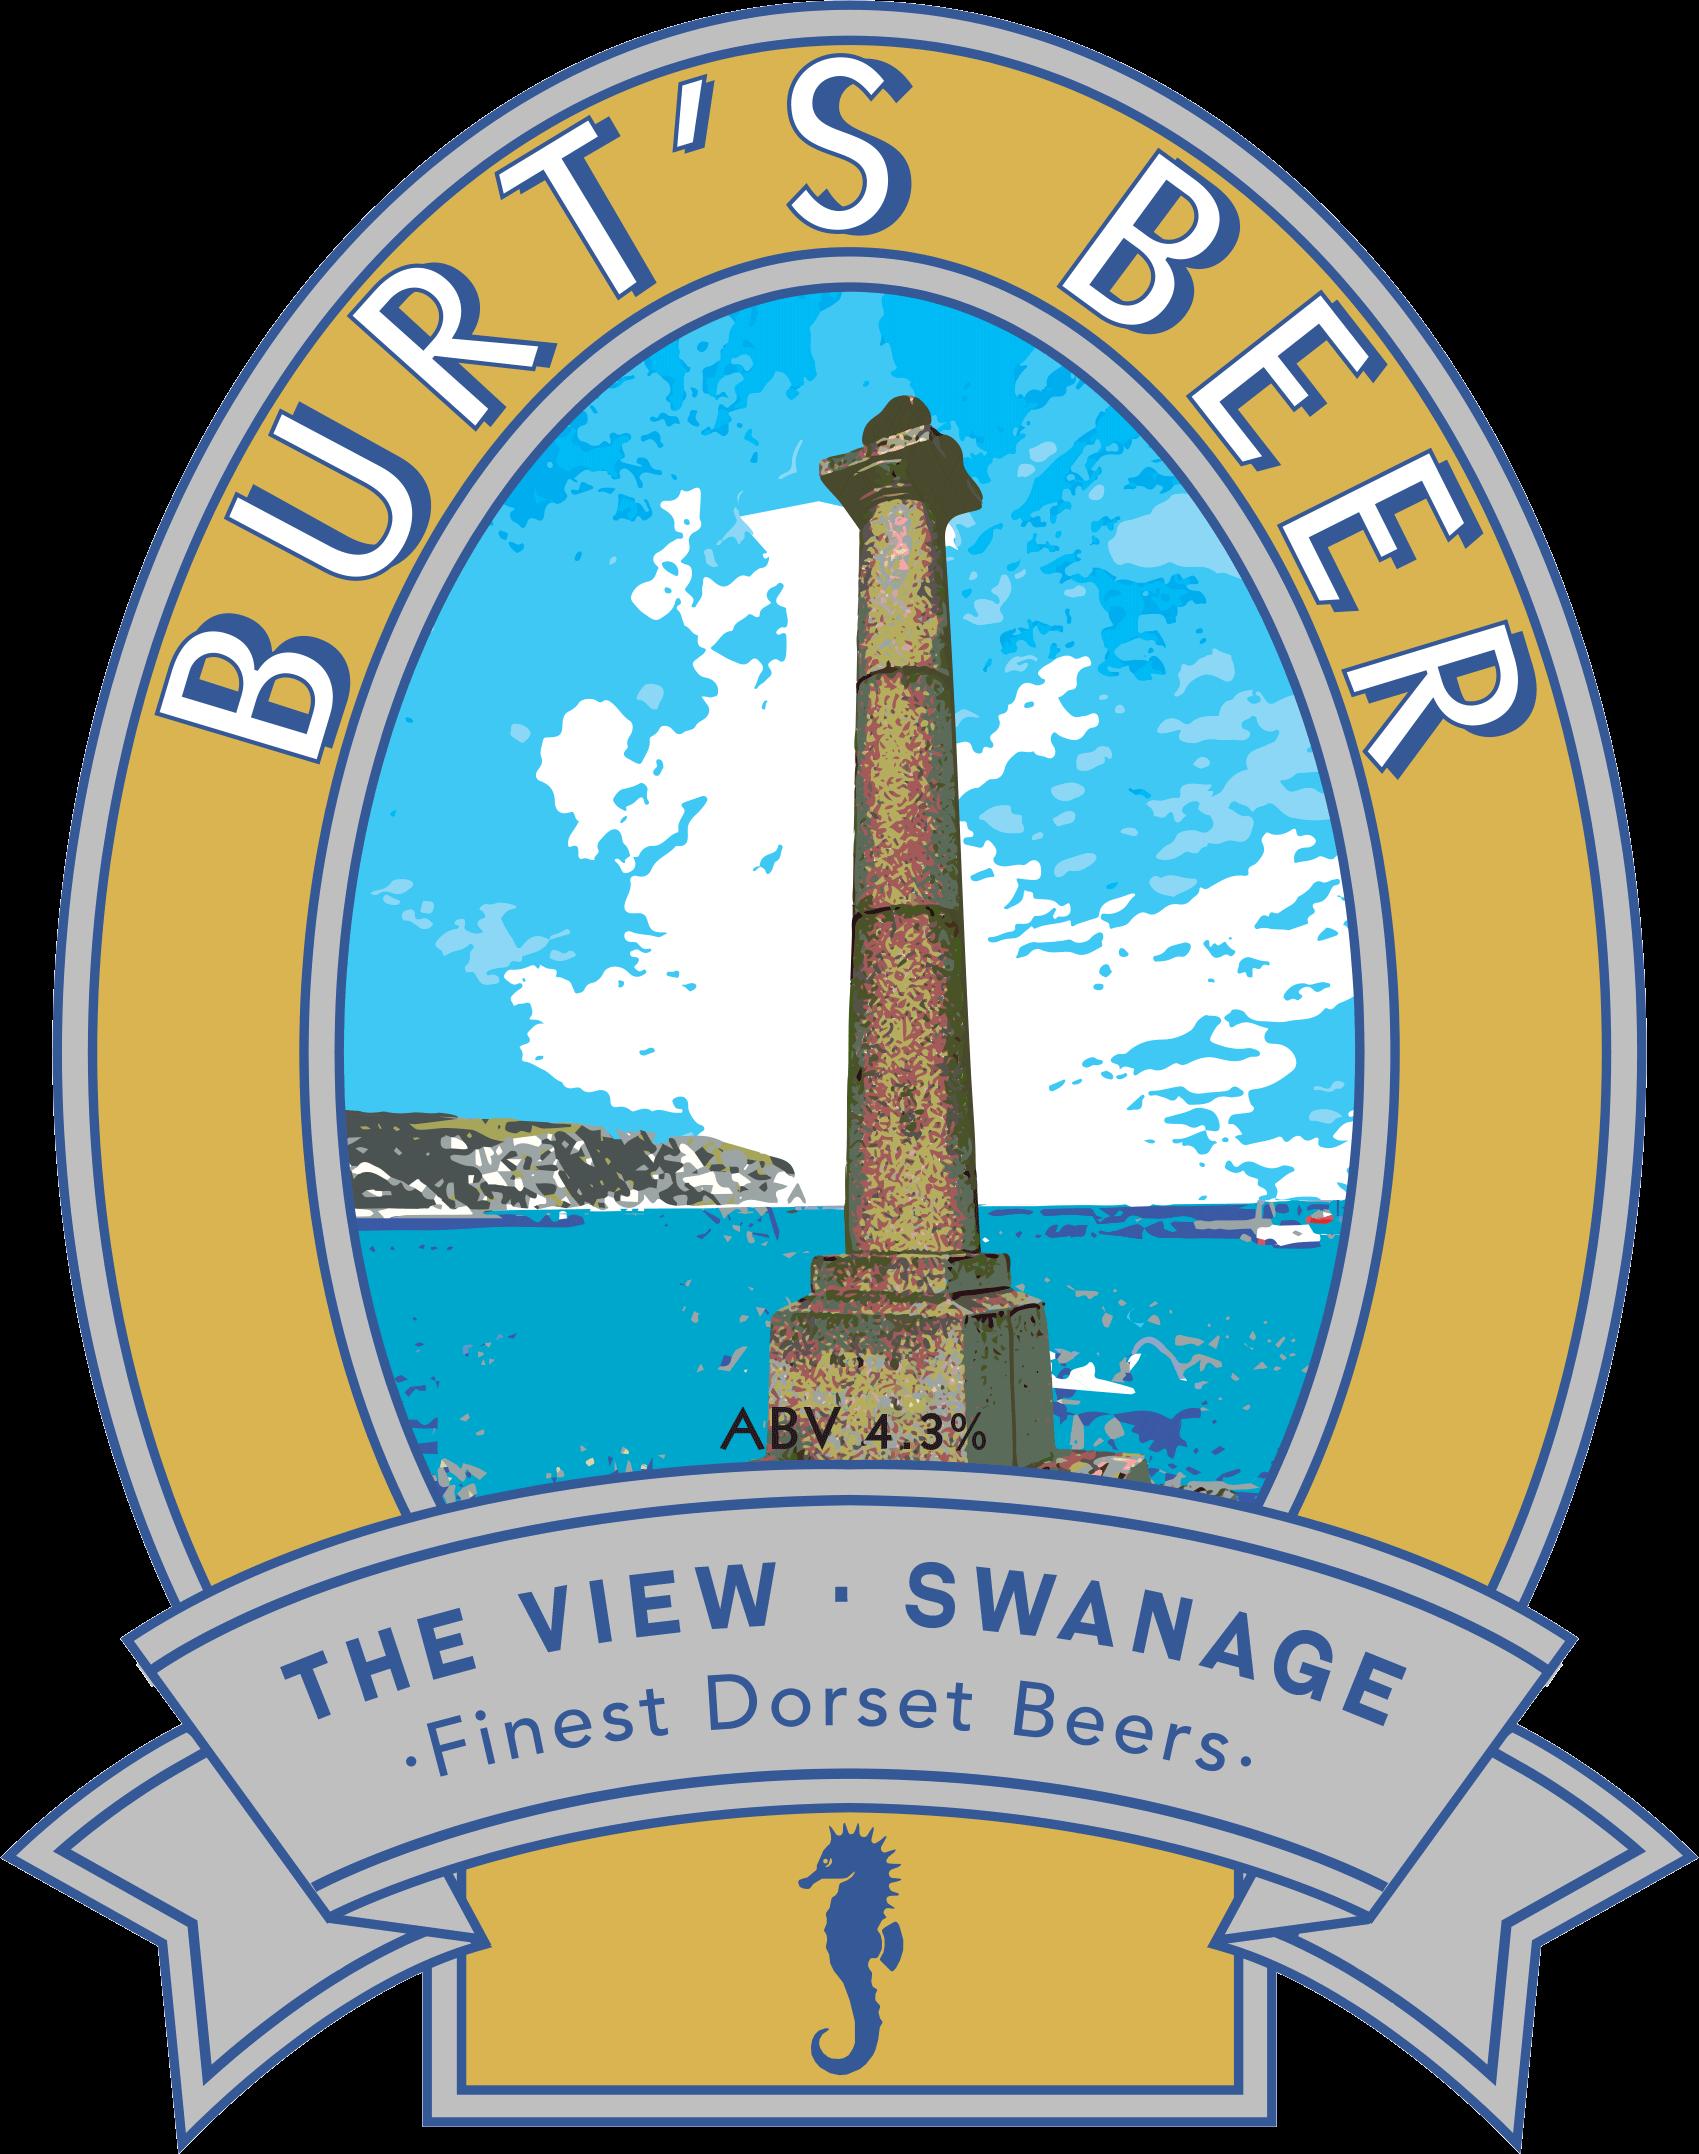 Isle of Purbeck Brewery Burt's Beer pumpclip PNG